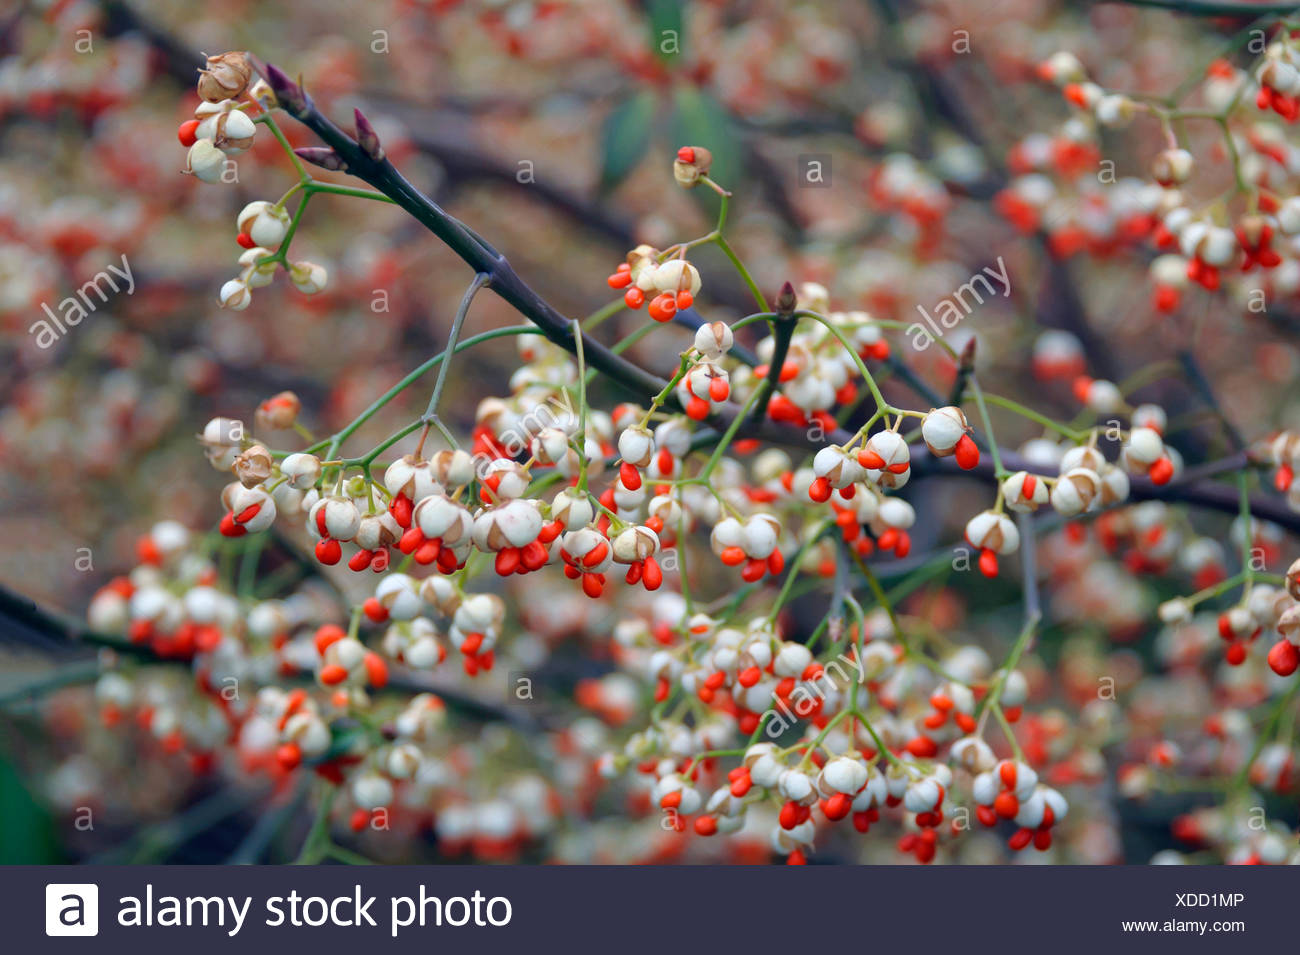 climbing euonymus, wintercreeper euonymus, winter-creeper (Euonymus fortunei 'Vegetus', Euonymus fortunei Vegetus), cultivar Vegetus, fruiting, Germany, Saxony - Stock Image